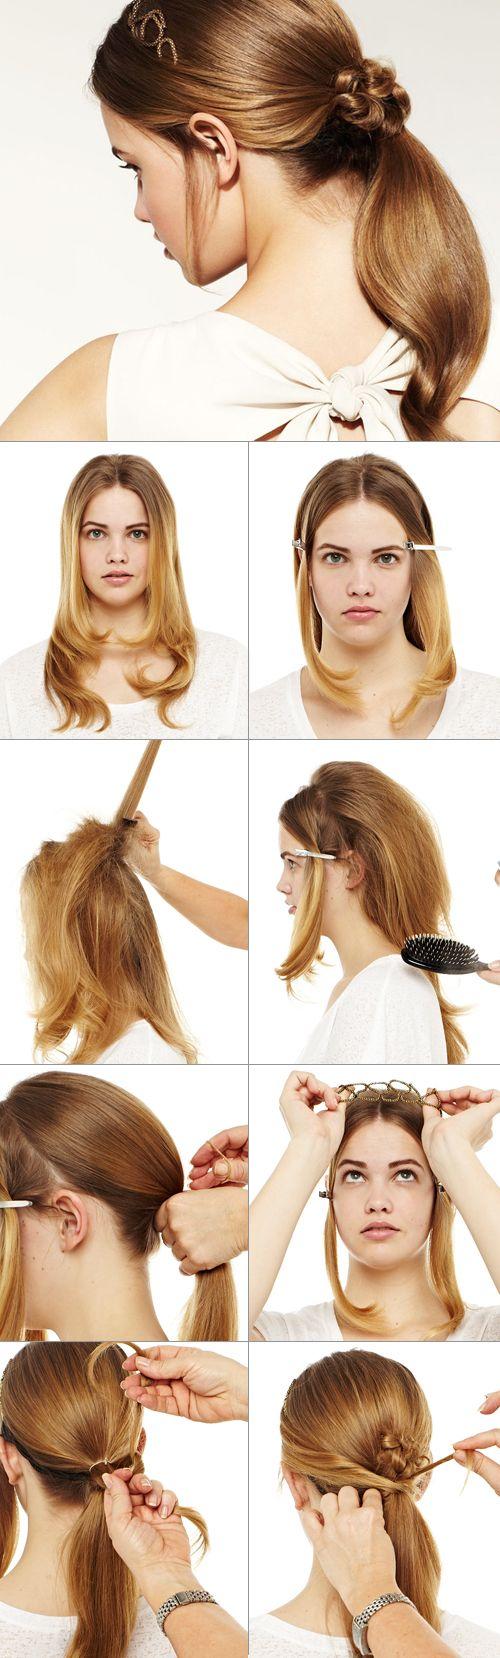 best Hair images on Pinterest Curly hair Hair care and Hair ideas